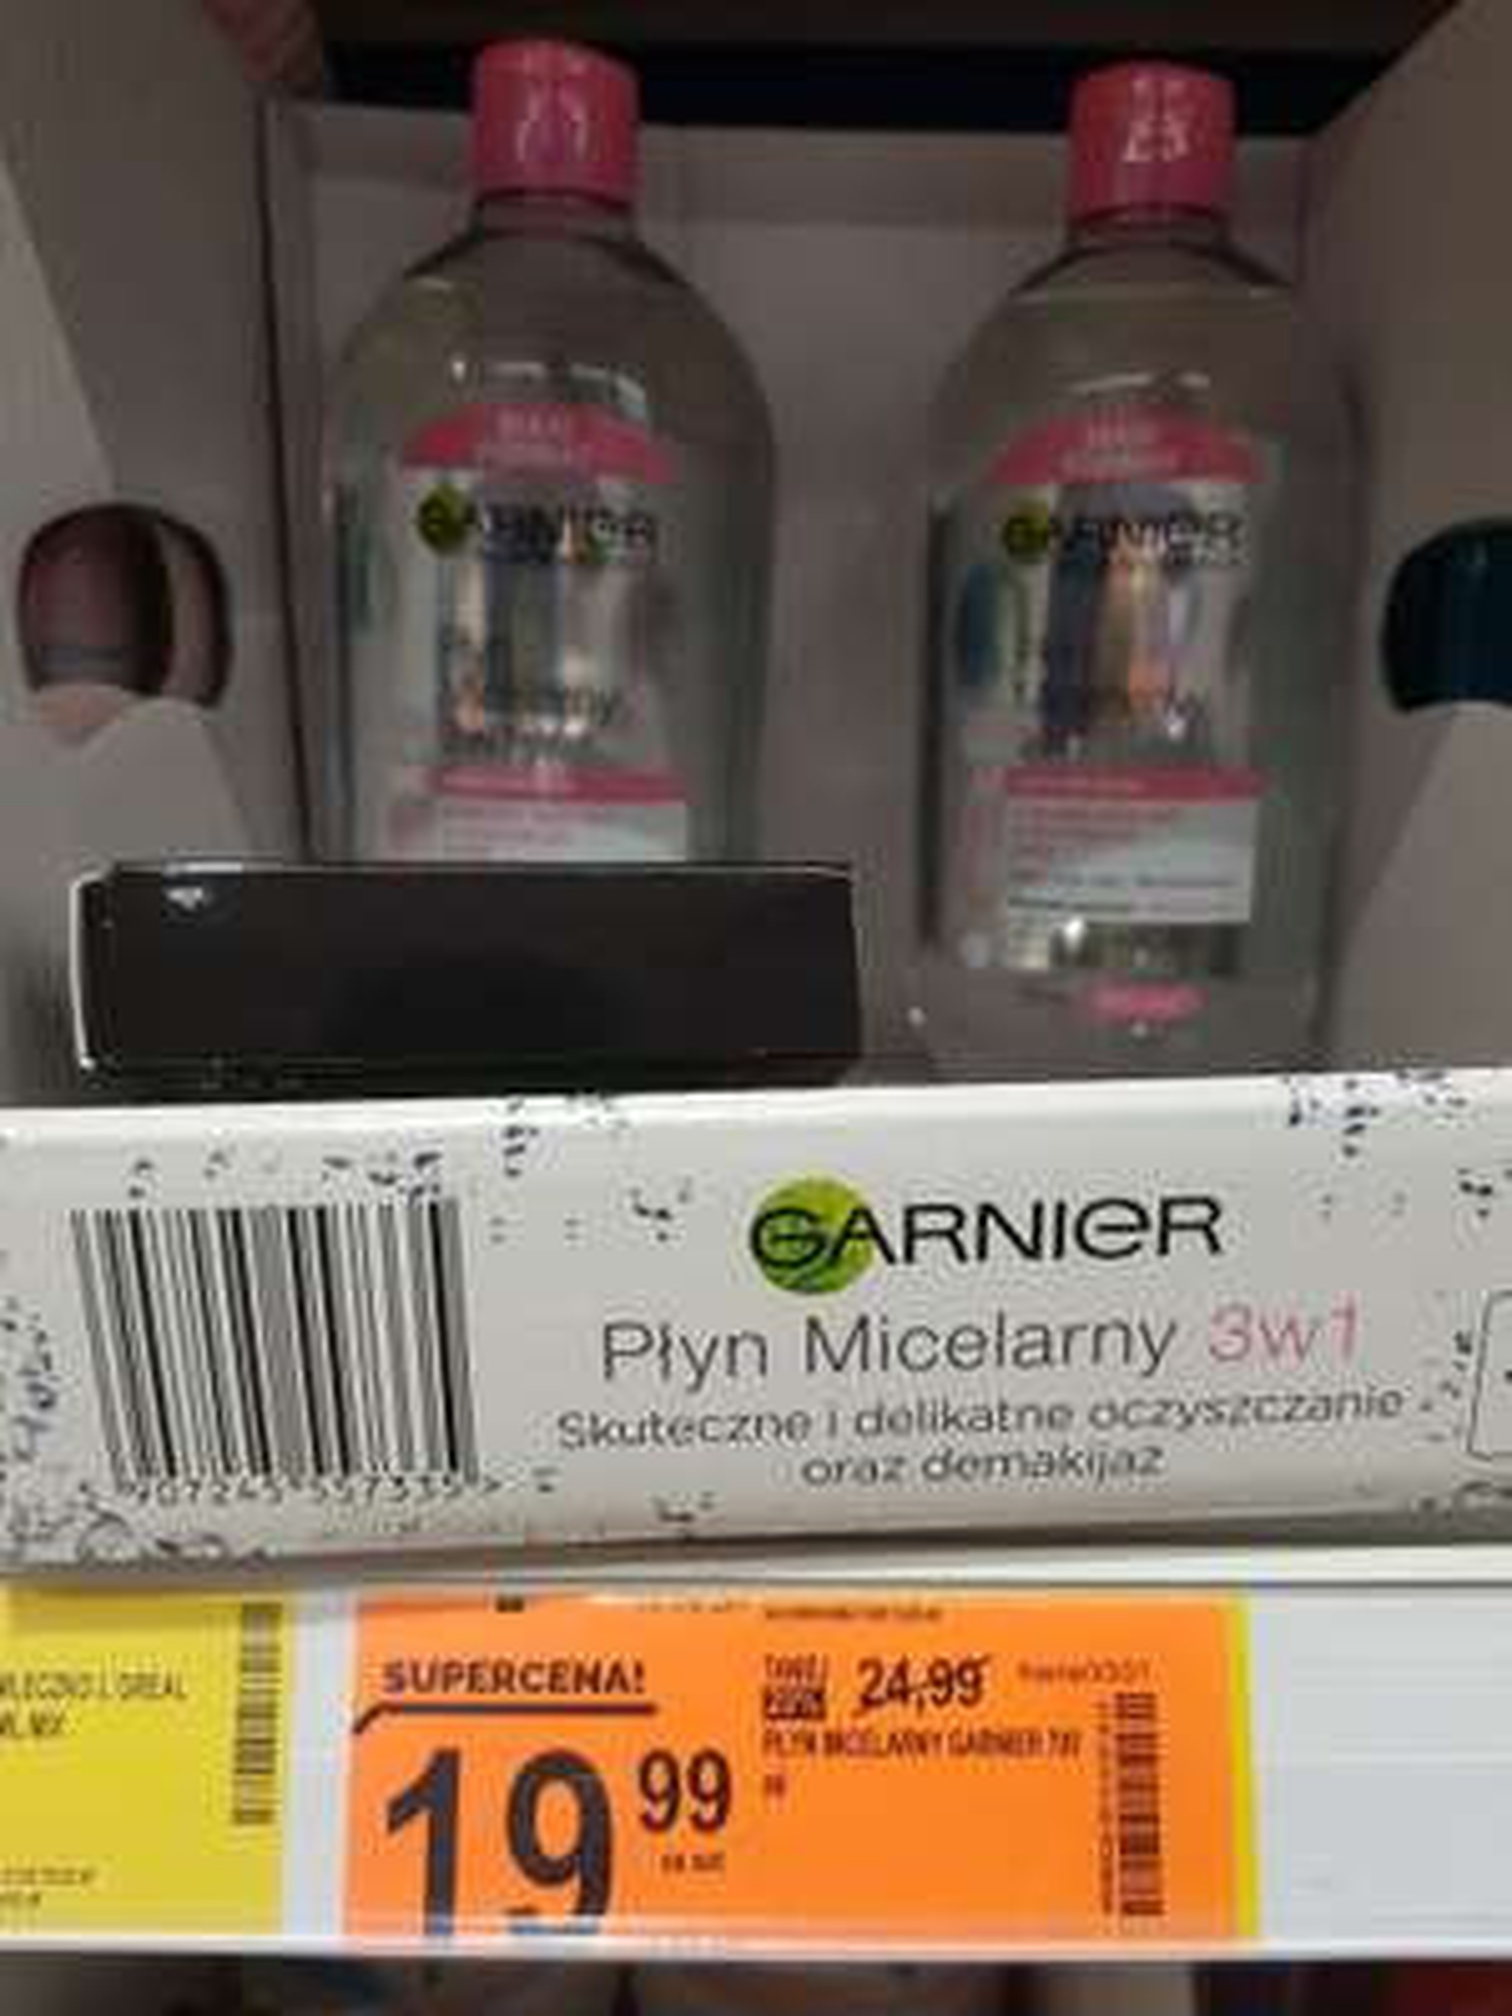 Płyn micelarny Garnier 700ml